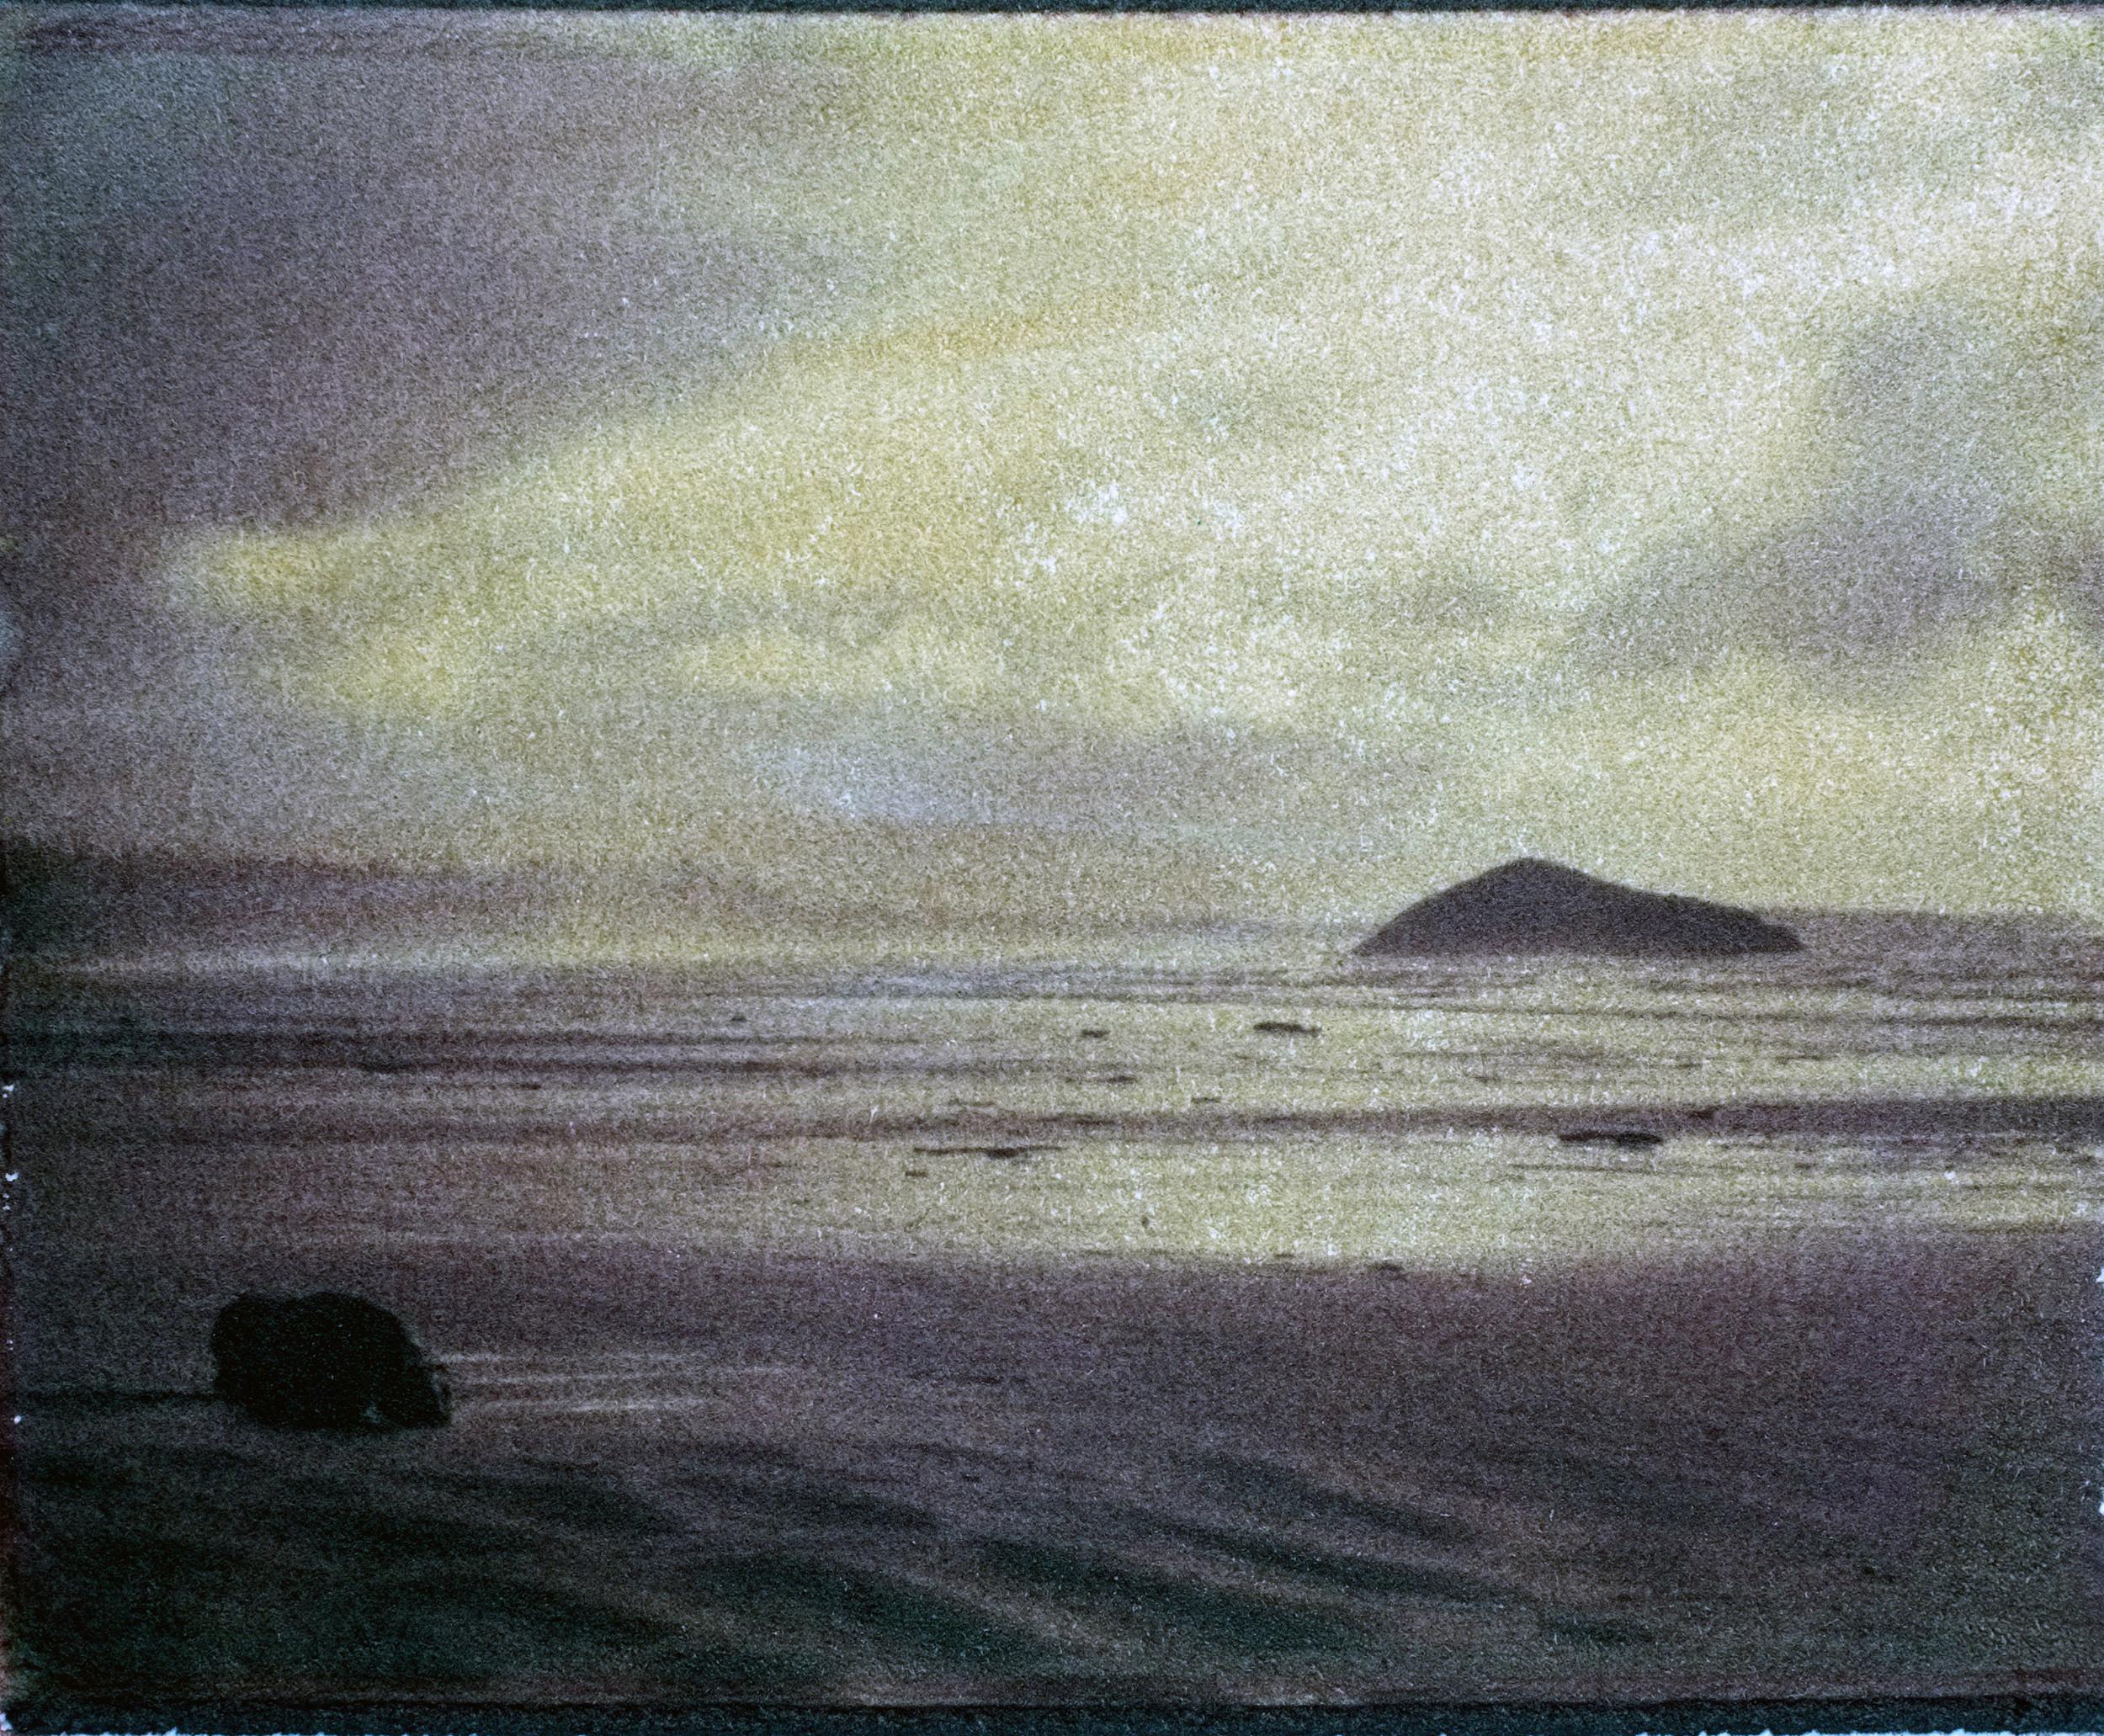 Memories of the Sea #3, Fiona Howarth.jpg